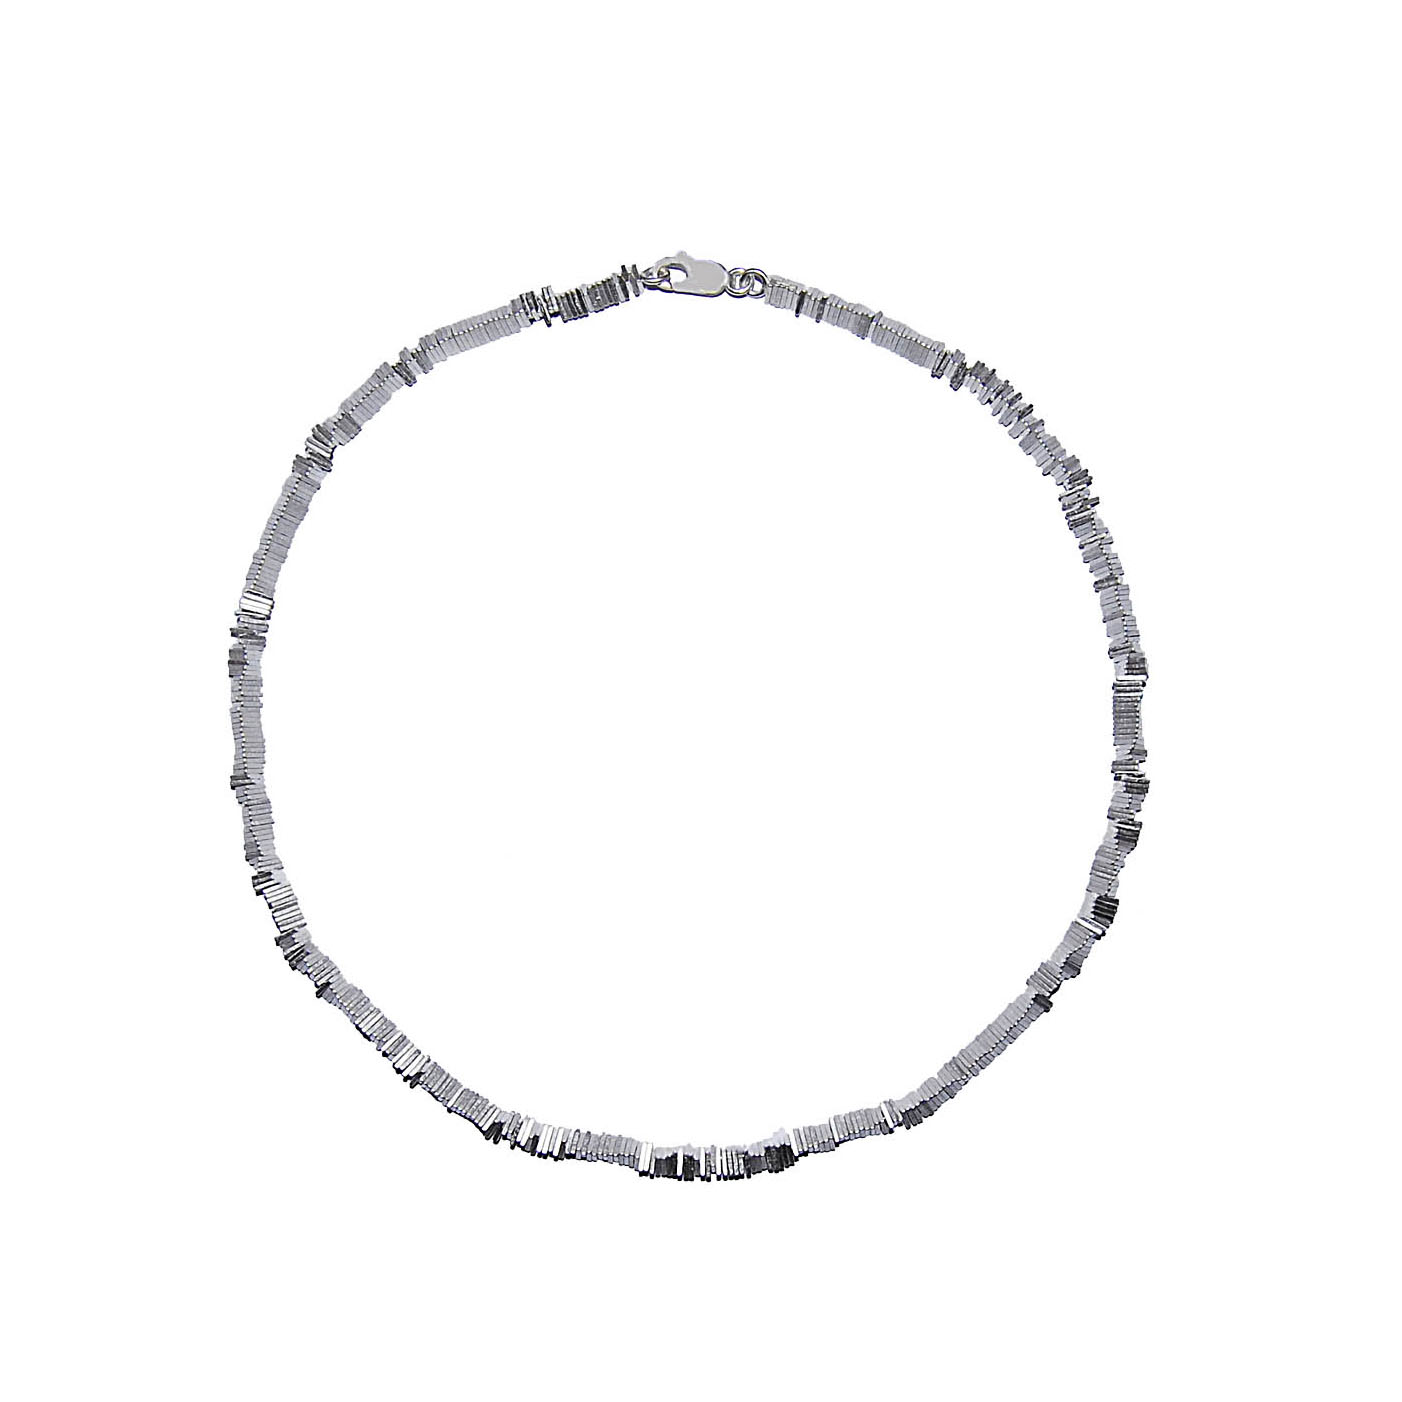 Tezer Black Rhodium-Plated Fine Bracelet